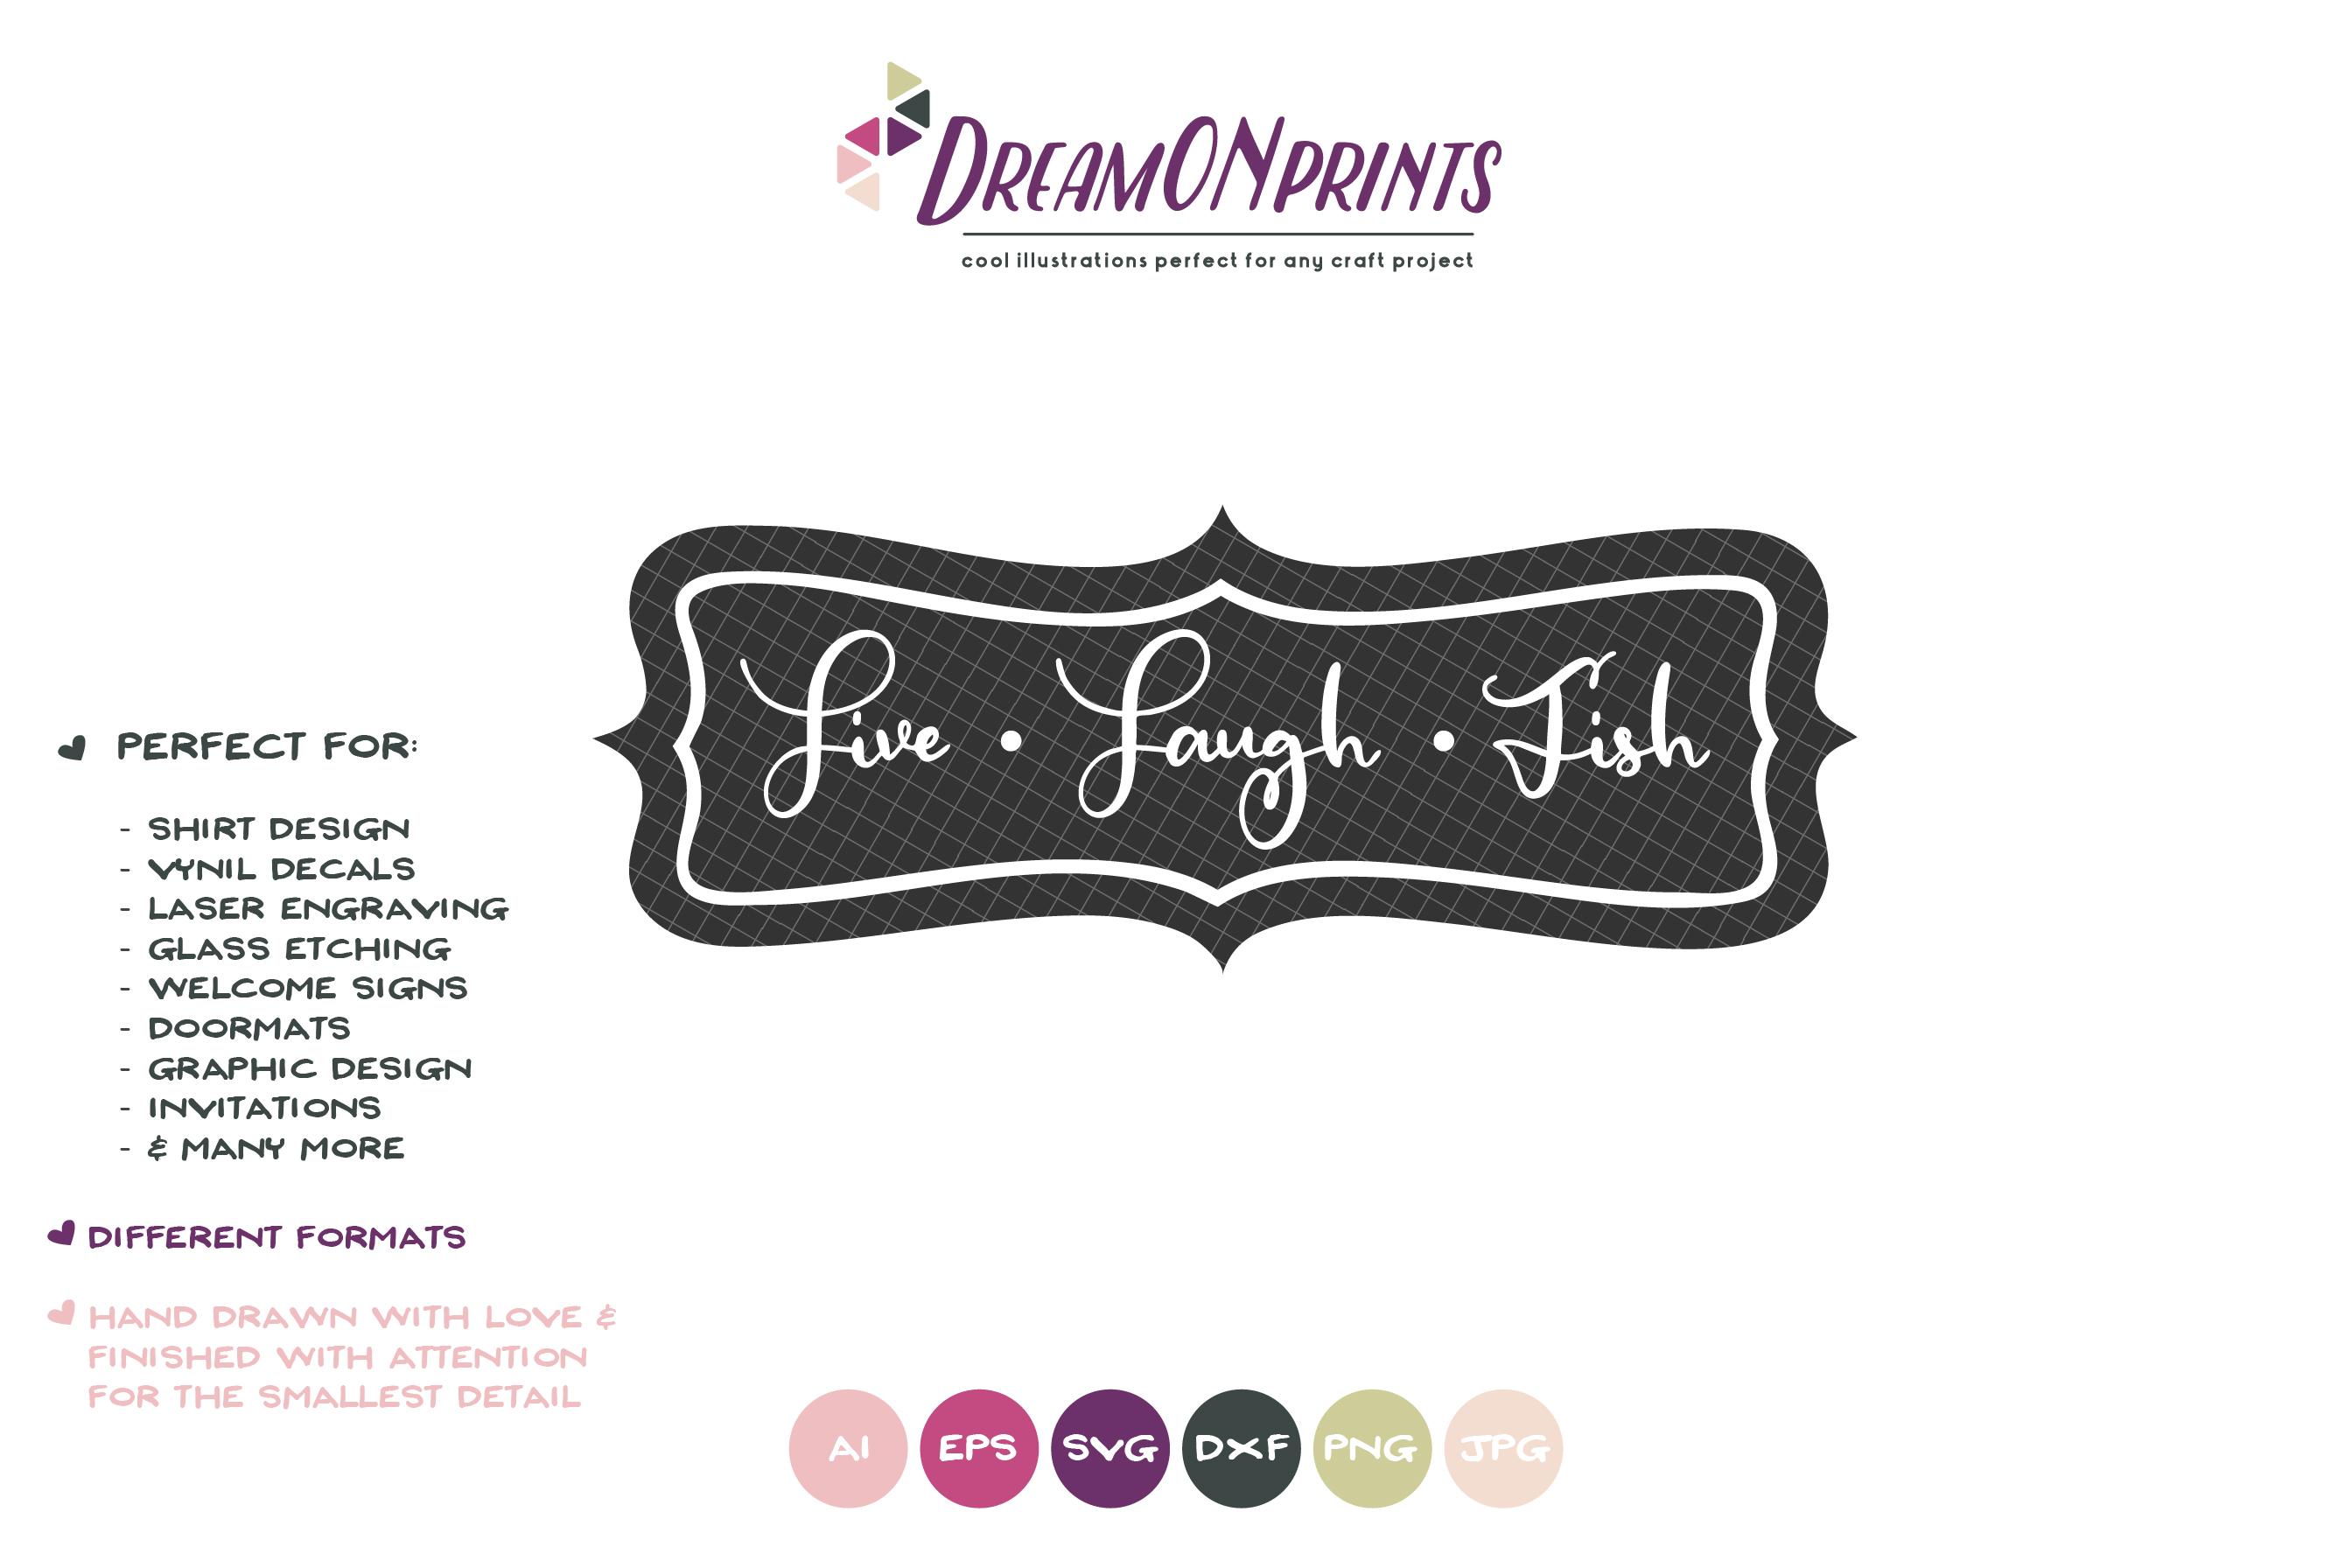 Live, Laugh, Fish SVG Cut Files - Fishing SVG example image 2